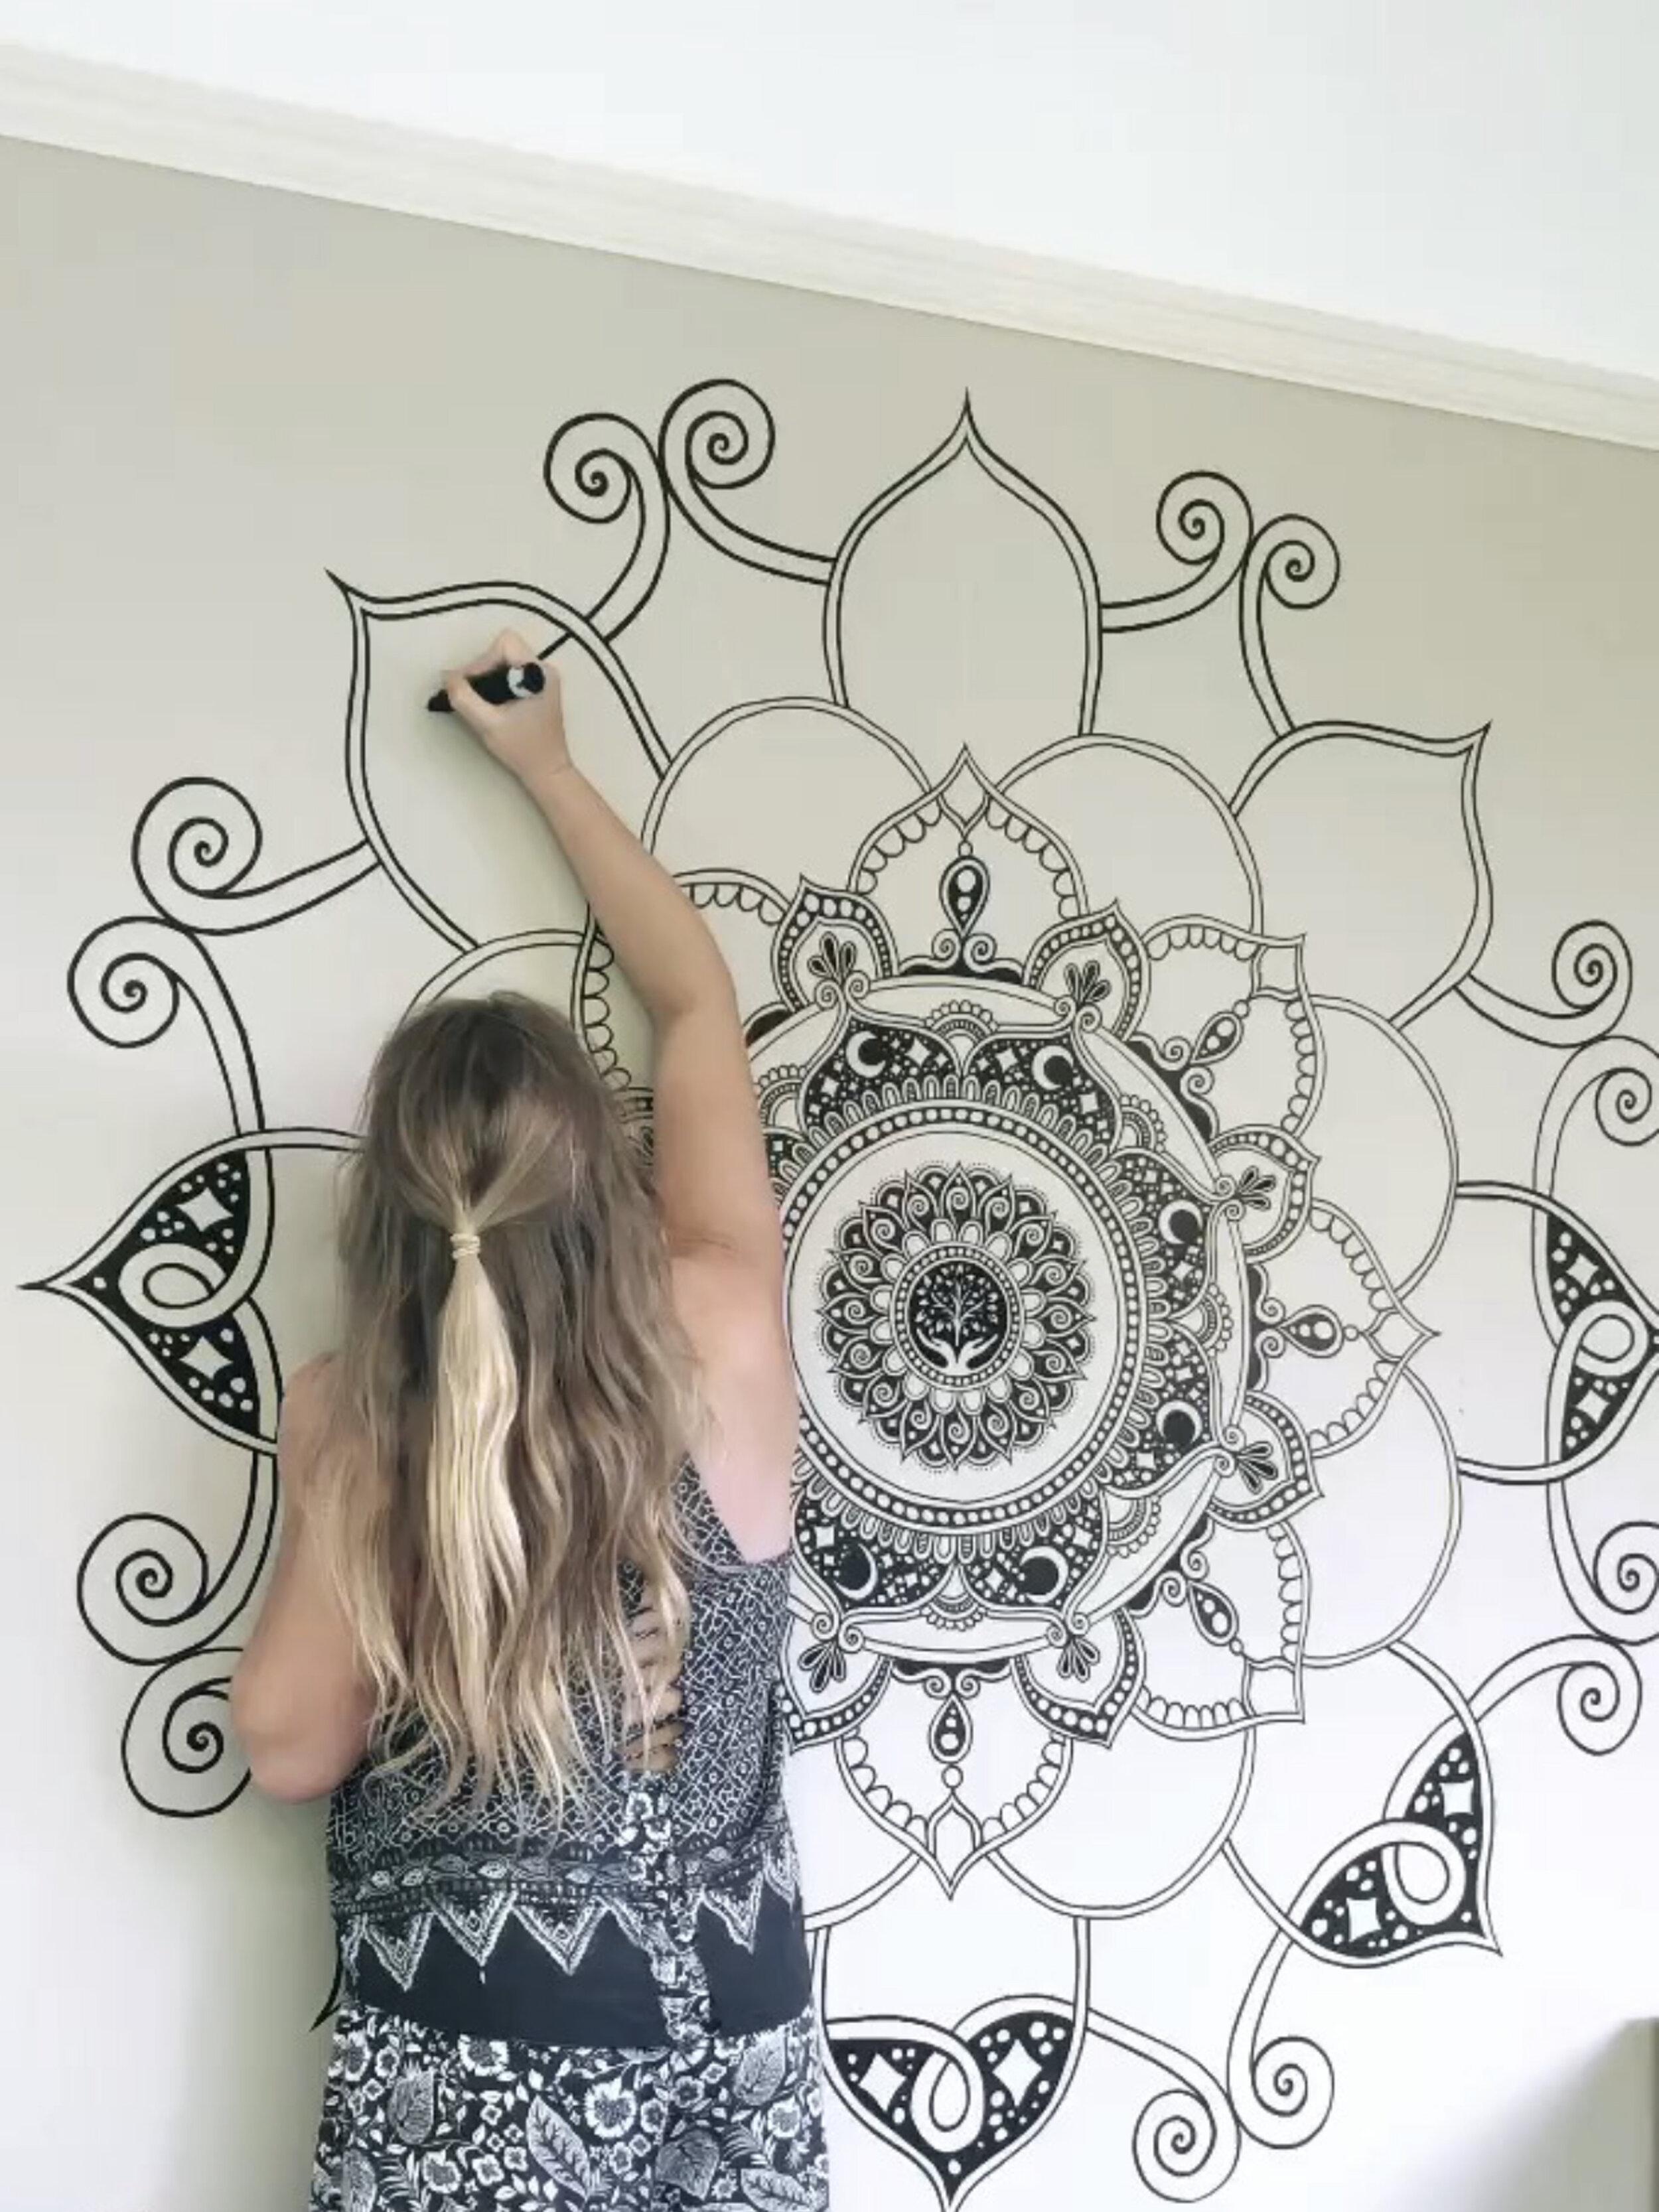 fortyonehundred-wall-mural-artist3.jpg